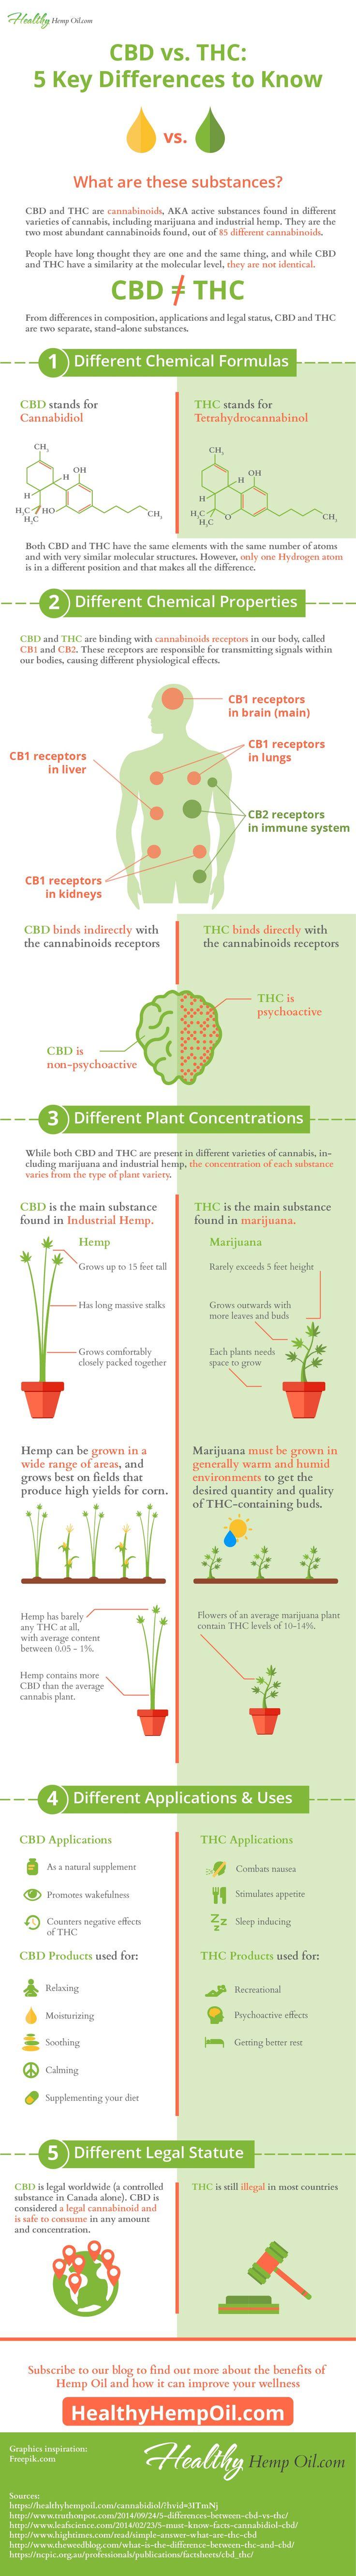 CBD vs THC - Healthy Hemp Oil.com